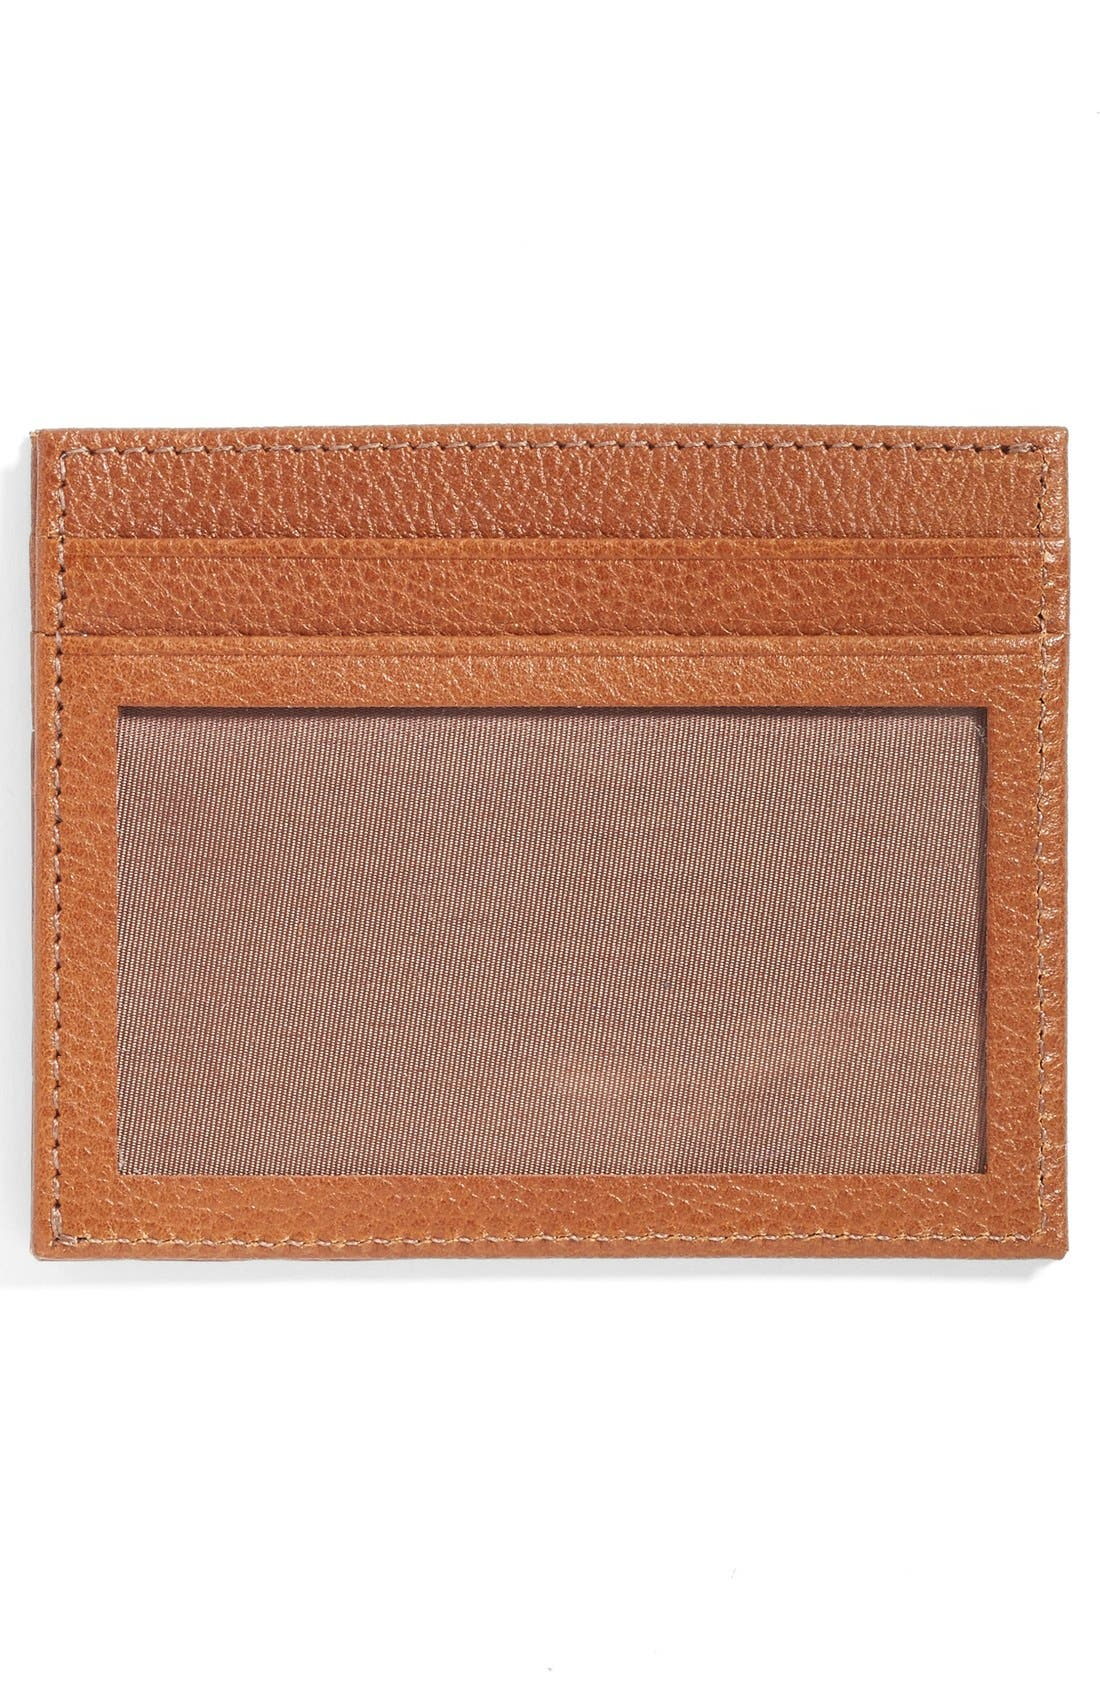 Executive Leather Card Case,                             Alternate thumbnail 8, color,